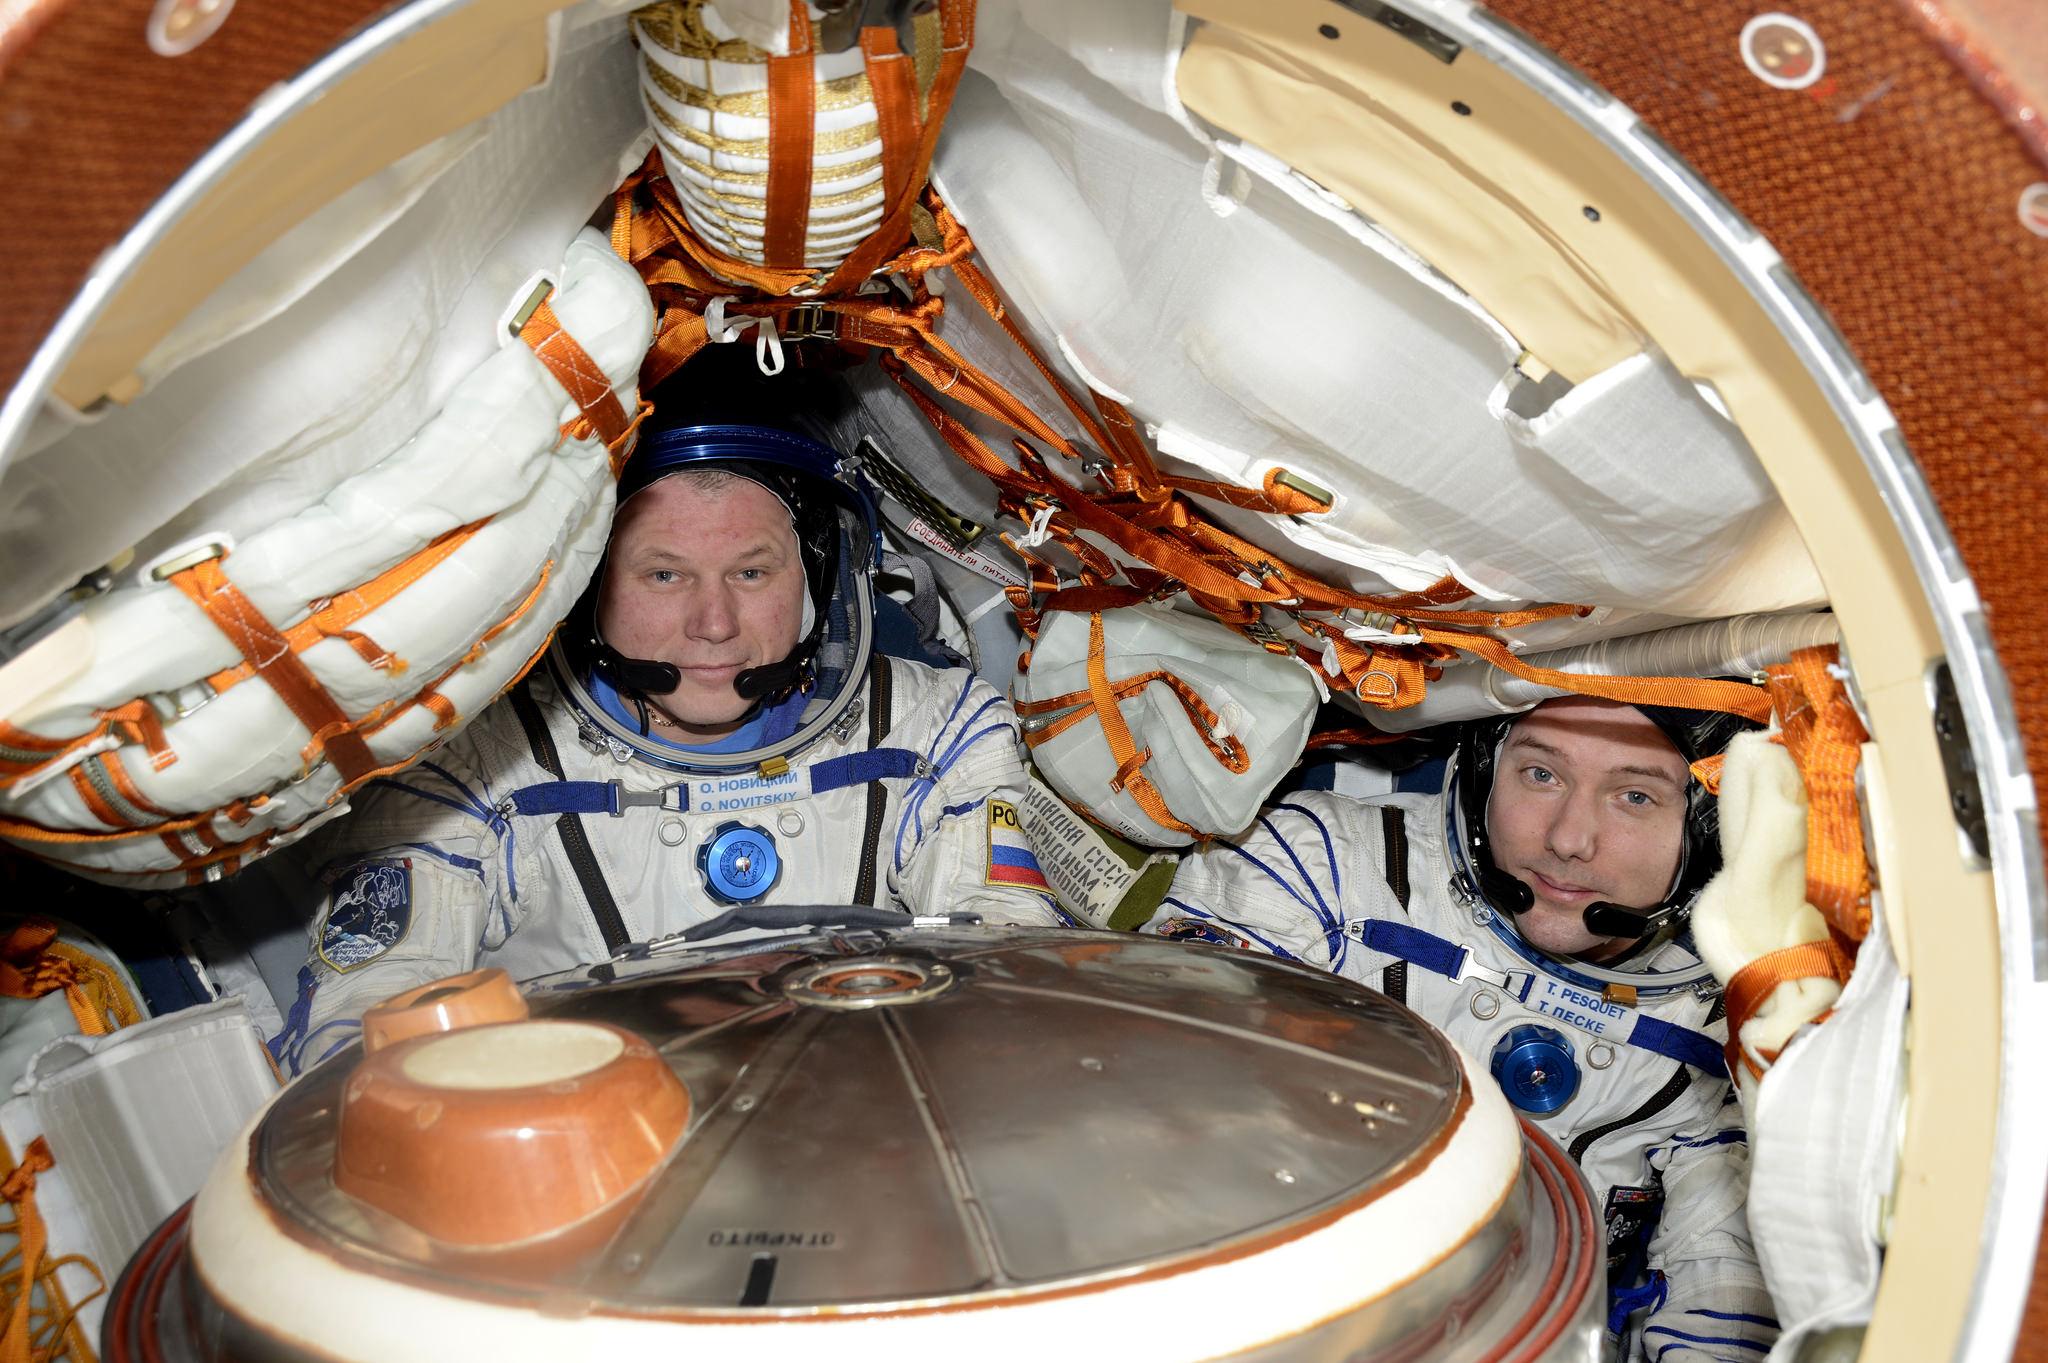 Oleg Novitskiy of Russia and Thomas Pesquet of the European Space Agency inside their Soyuz MS-03 spacecraft. Credit: NASA